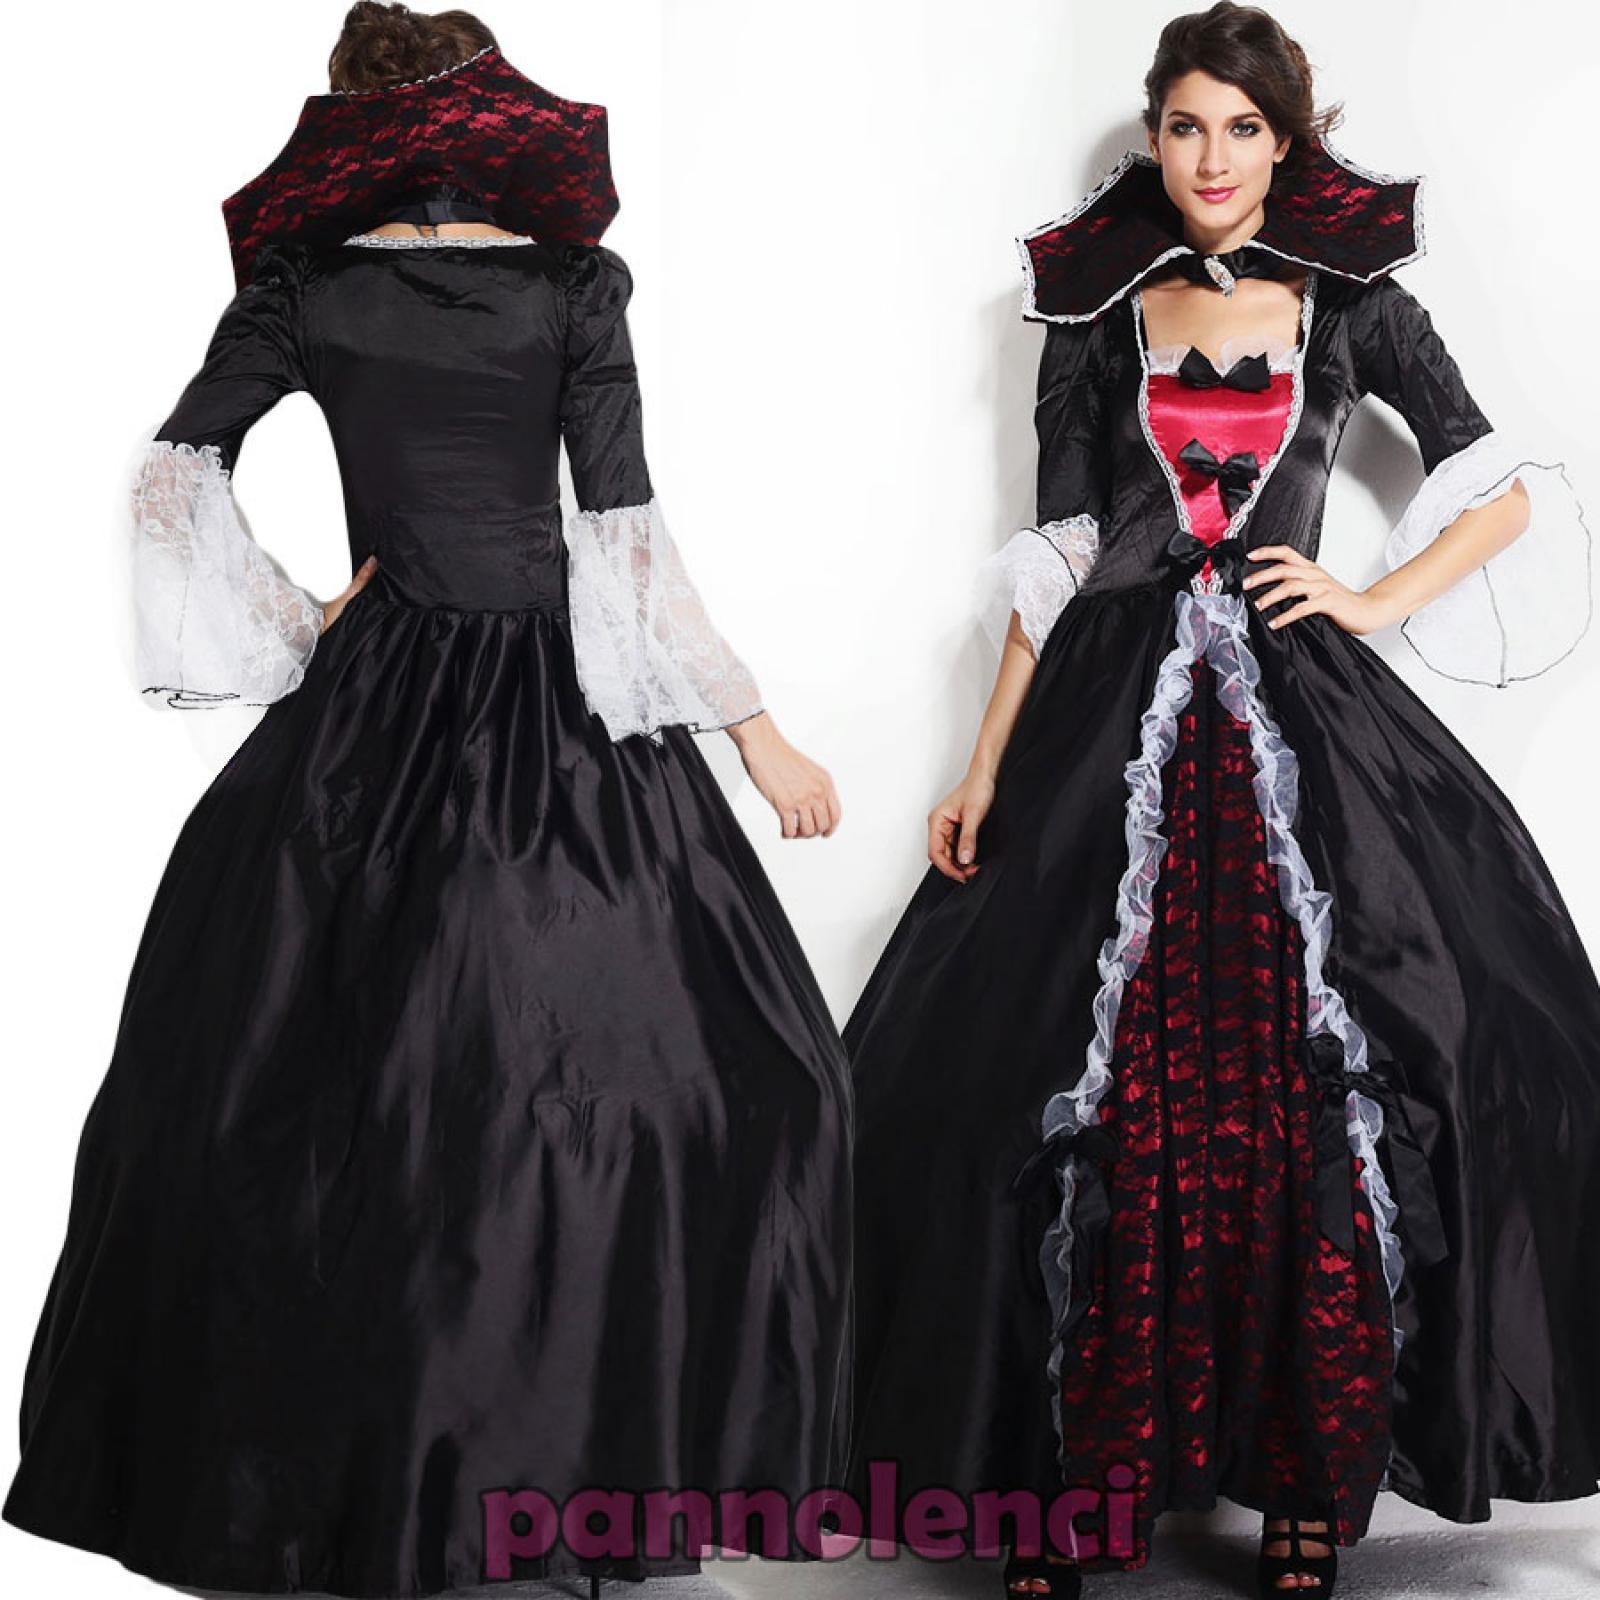 karnevalkleid frau kost m hexe vampir luxus halloween neu dl 1339 ebay. Black Bedroom Furniture Sets. Home Design Ideas